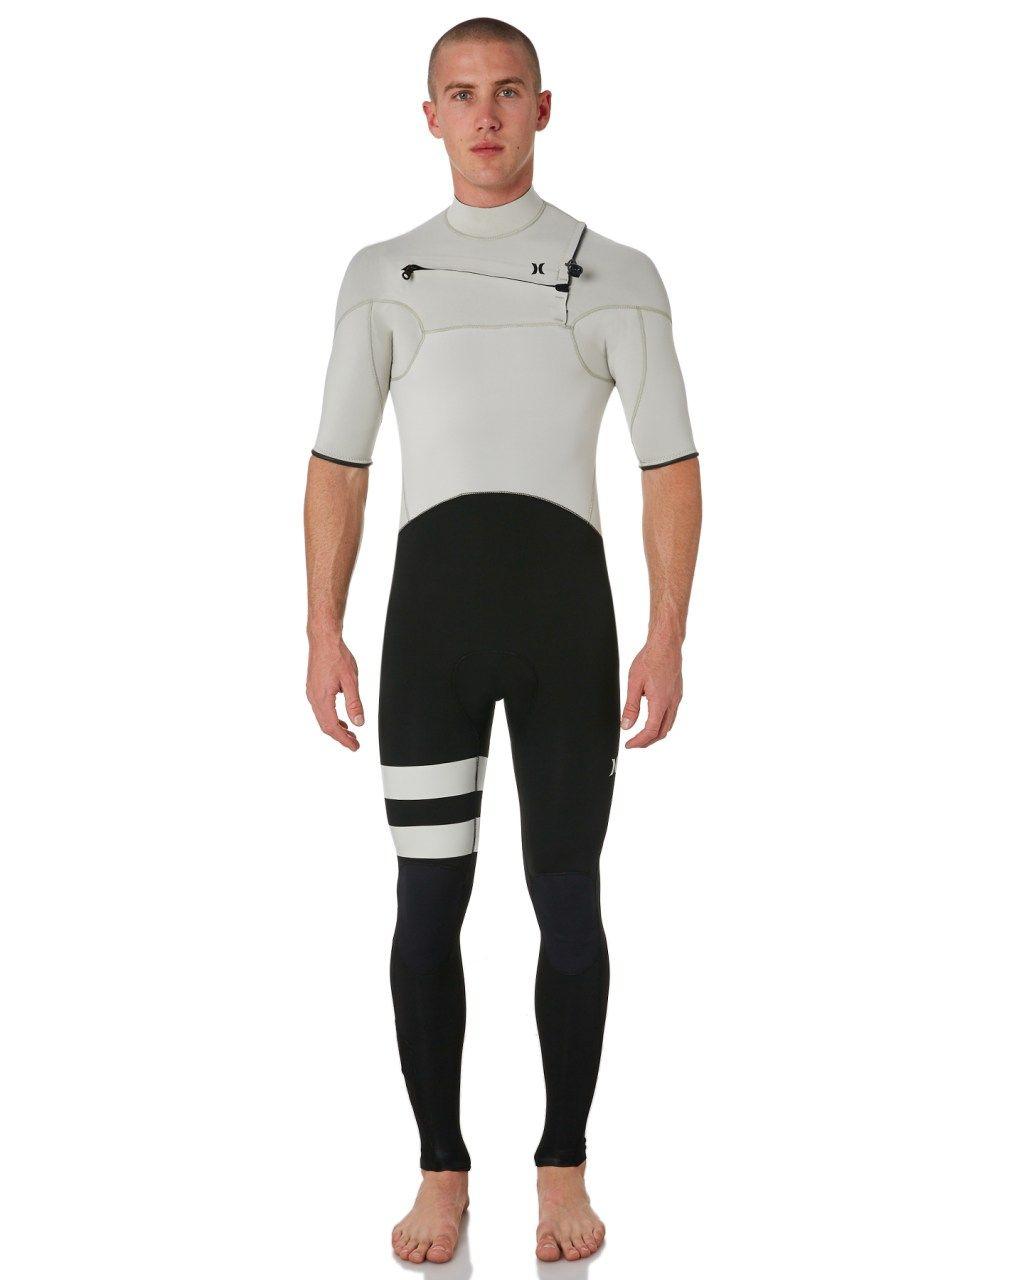 fdba8bc910 Hurley Advantage Plus 2X2Mm Ss Steamer Wetsuit Light Cream Light Cream Surfing  Wetsuits Size S